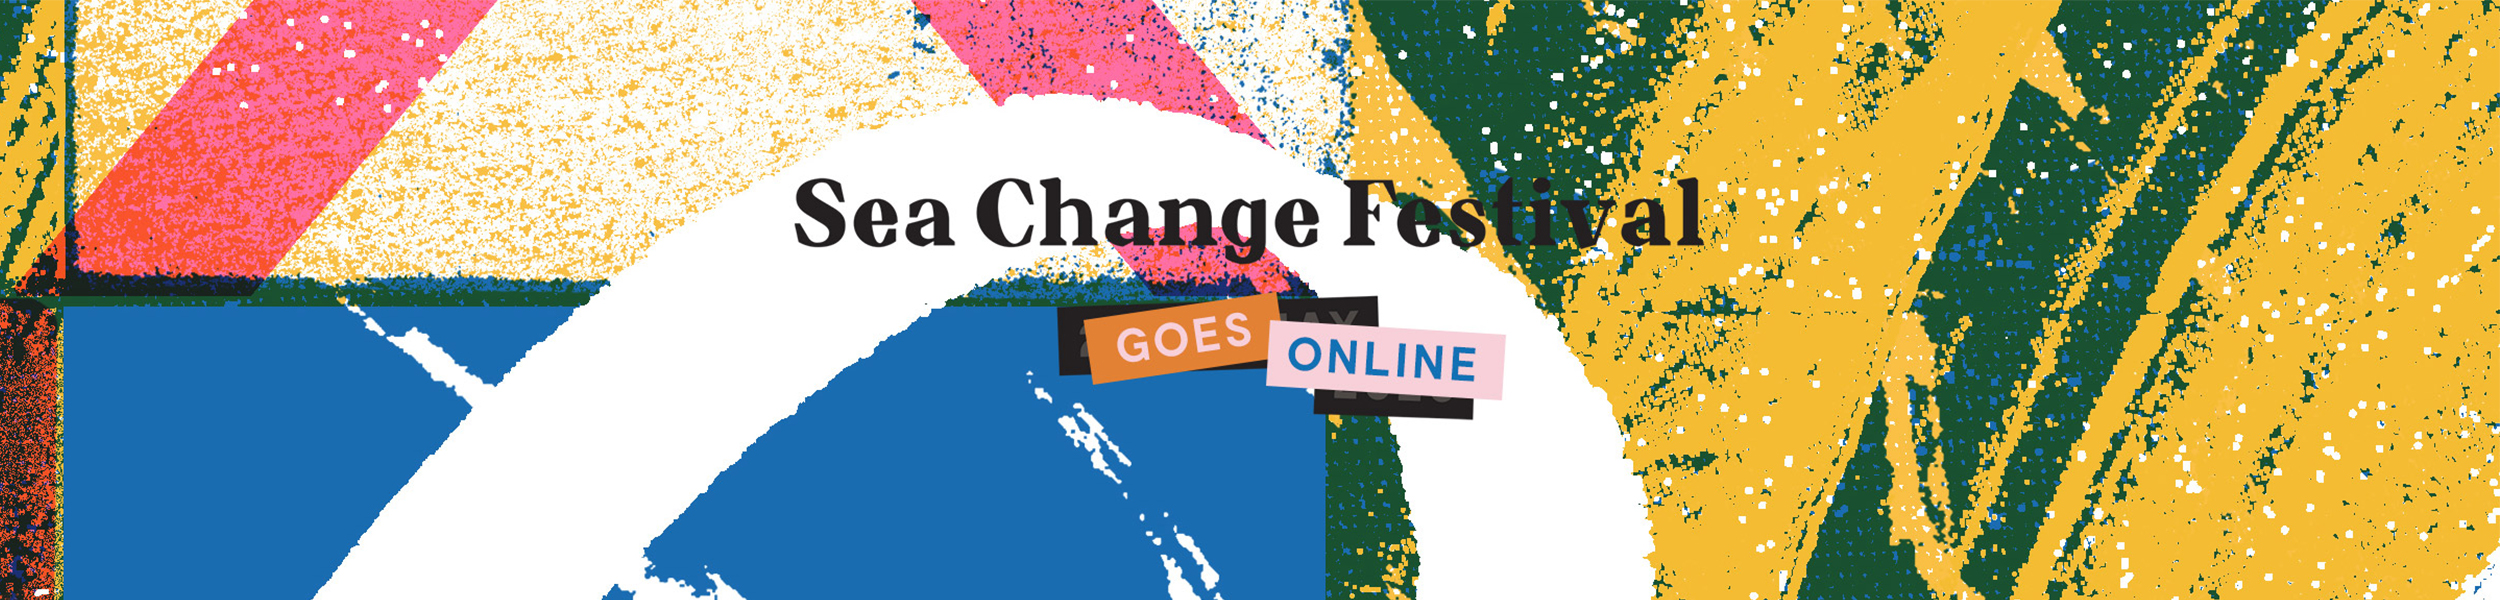 Bing & Ruth - 4AD X Sea Change Goes Online